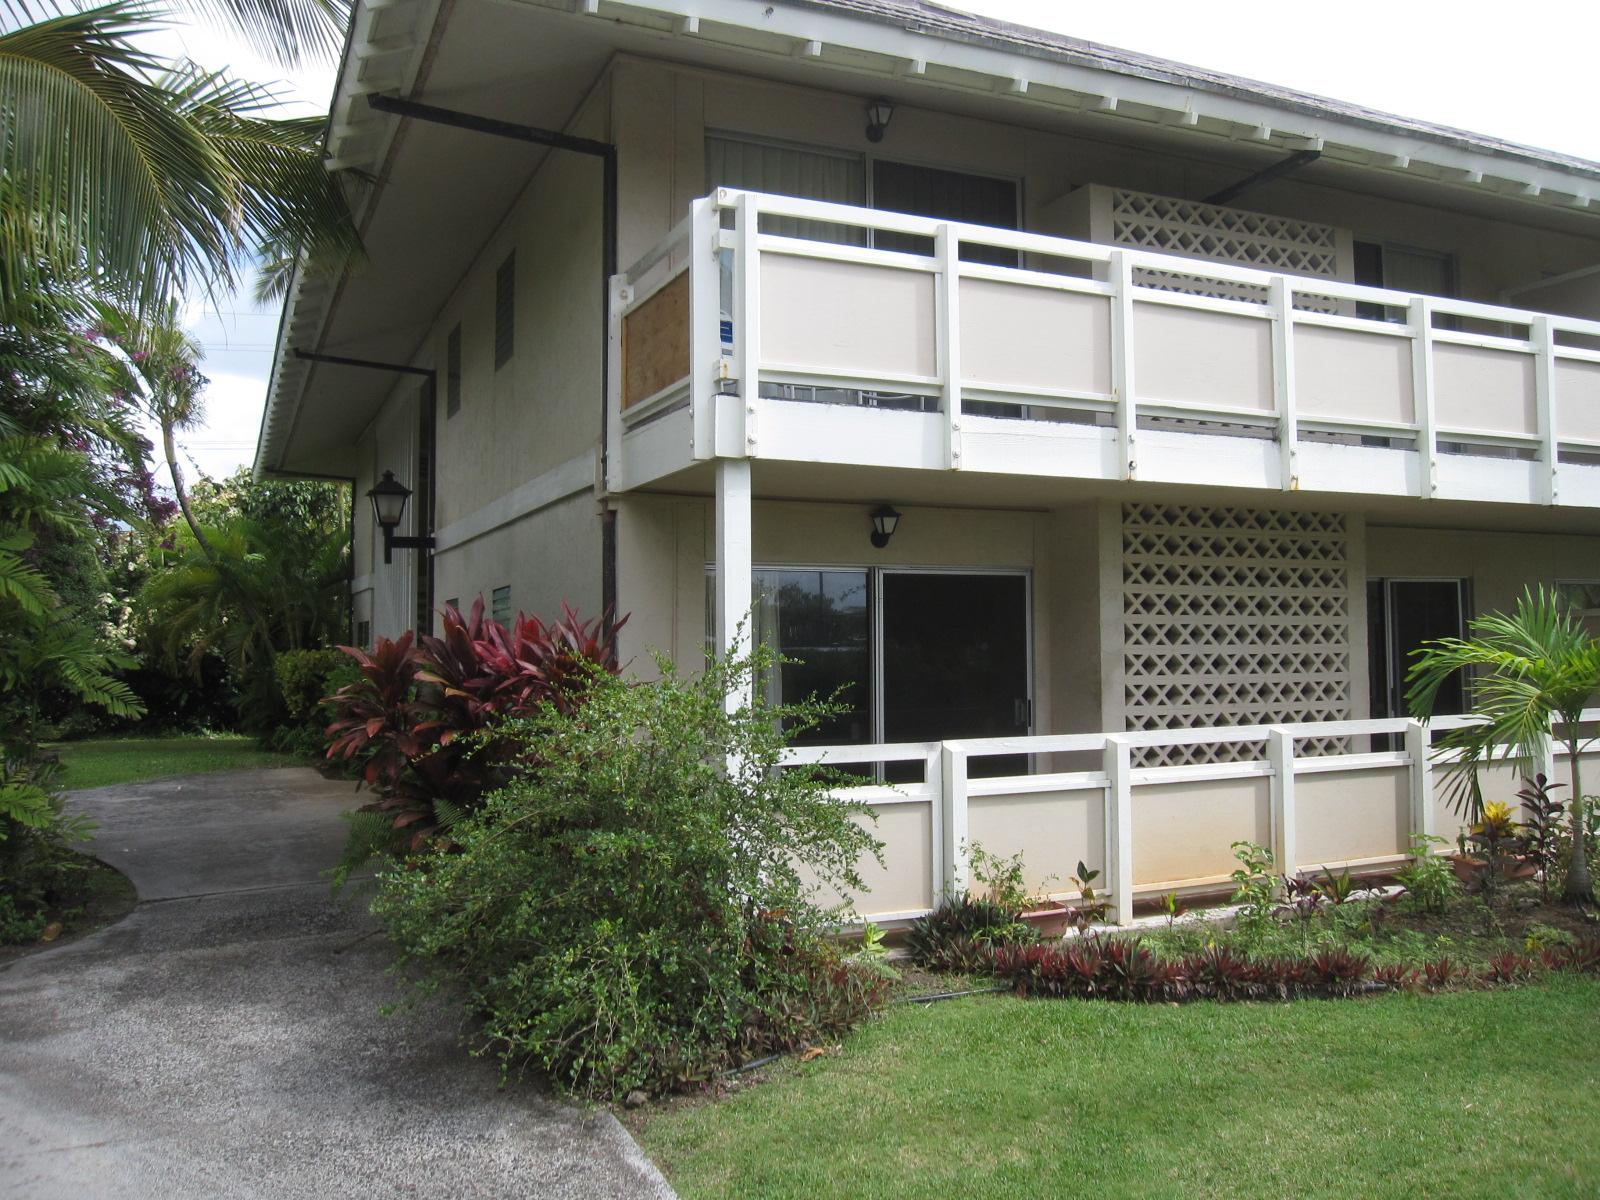 kauai real estate for sale plantation hale condos